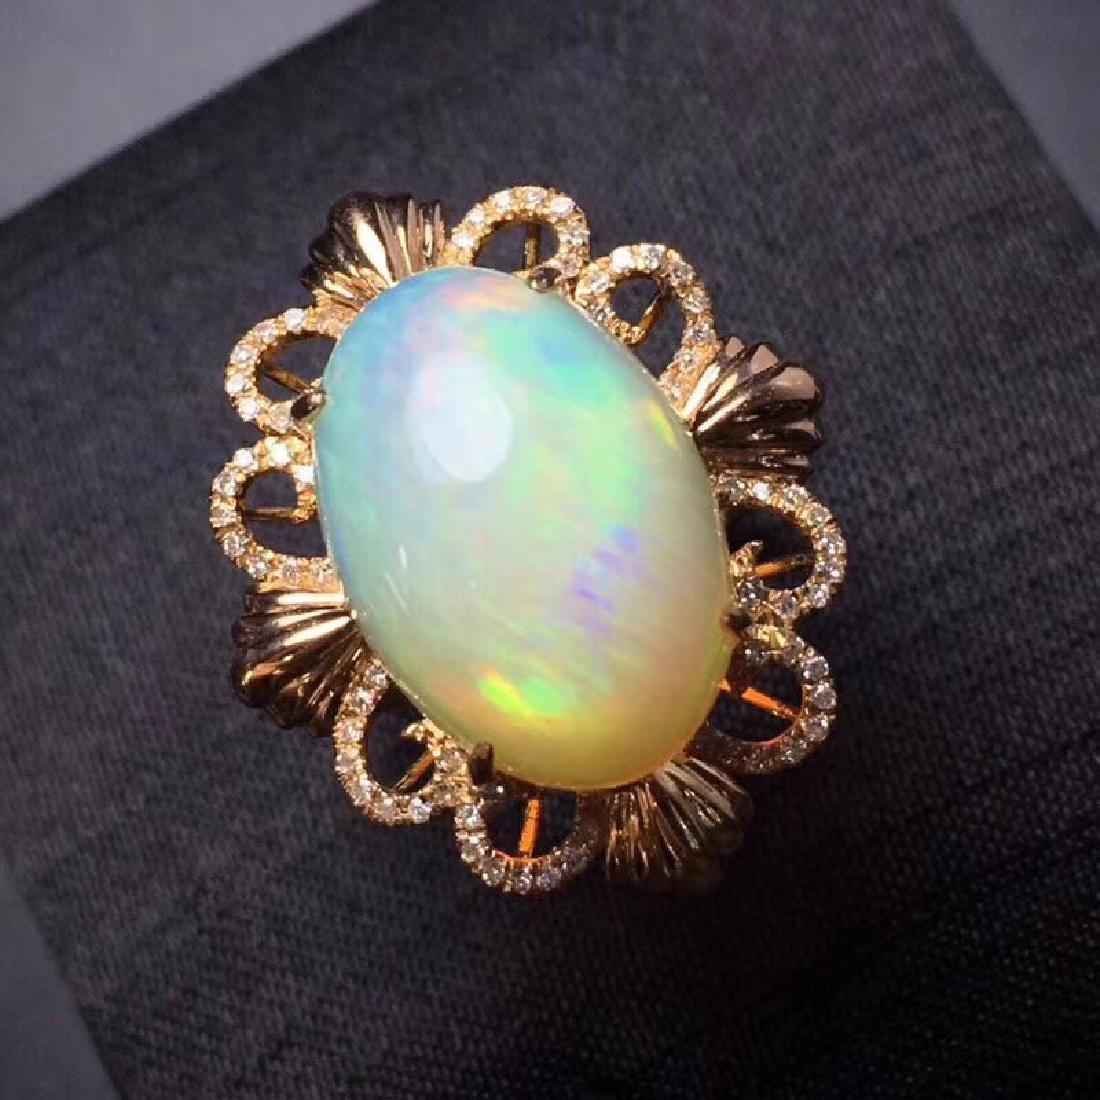 7.7 CTW Opal & VS Diamond Ring 18K - 9